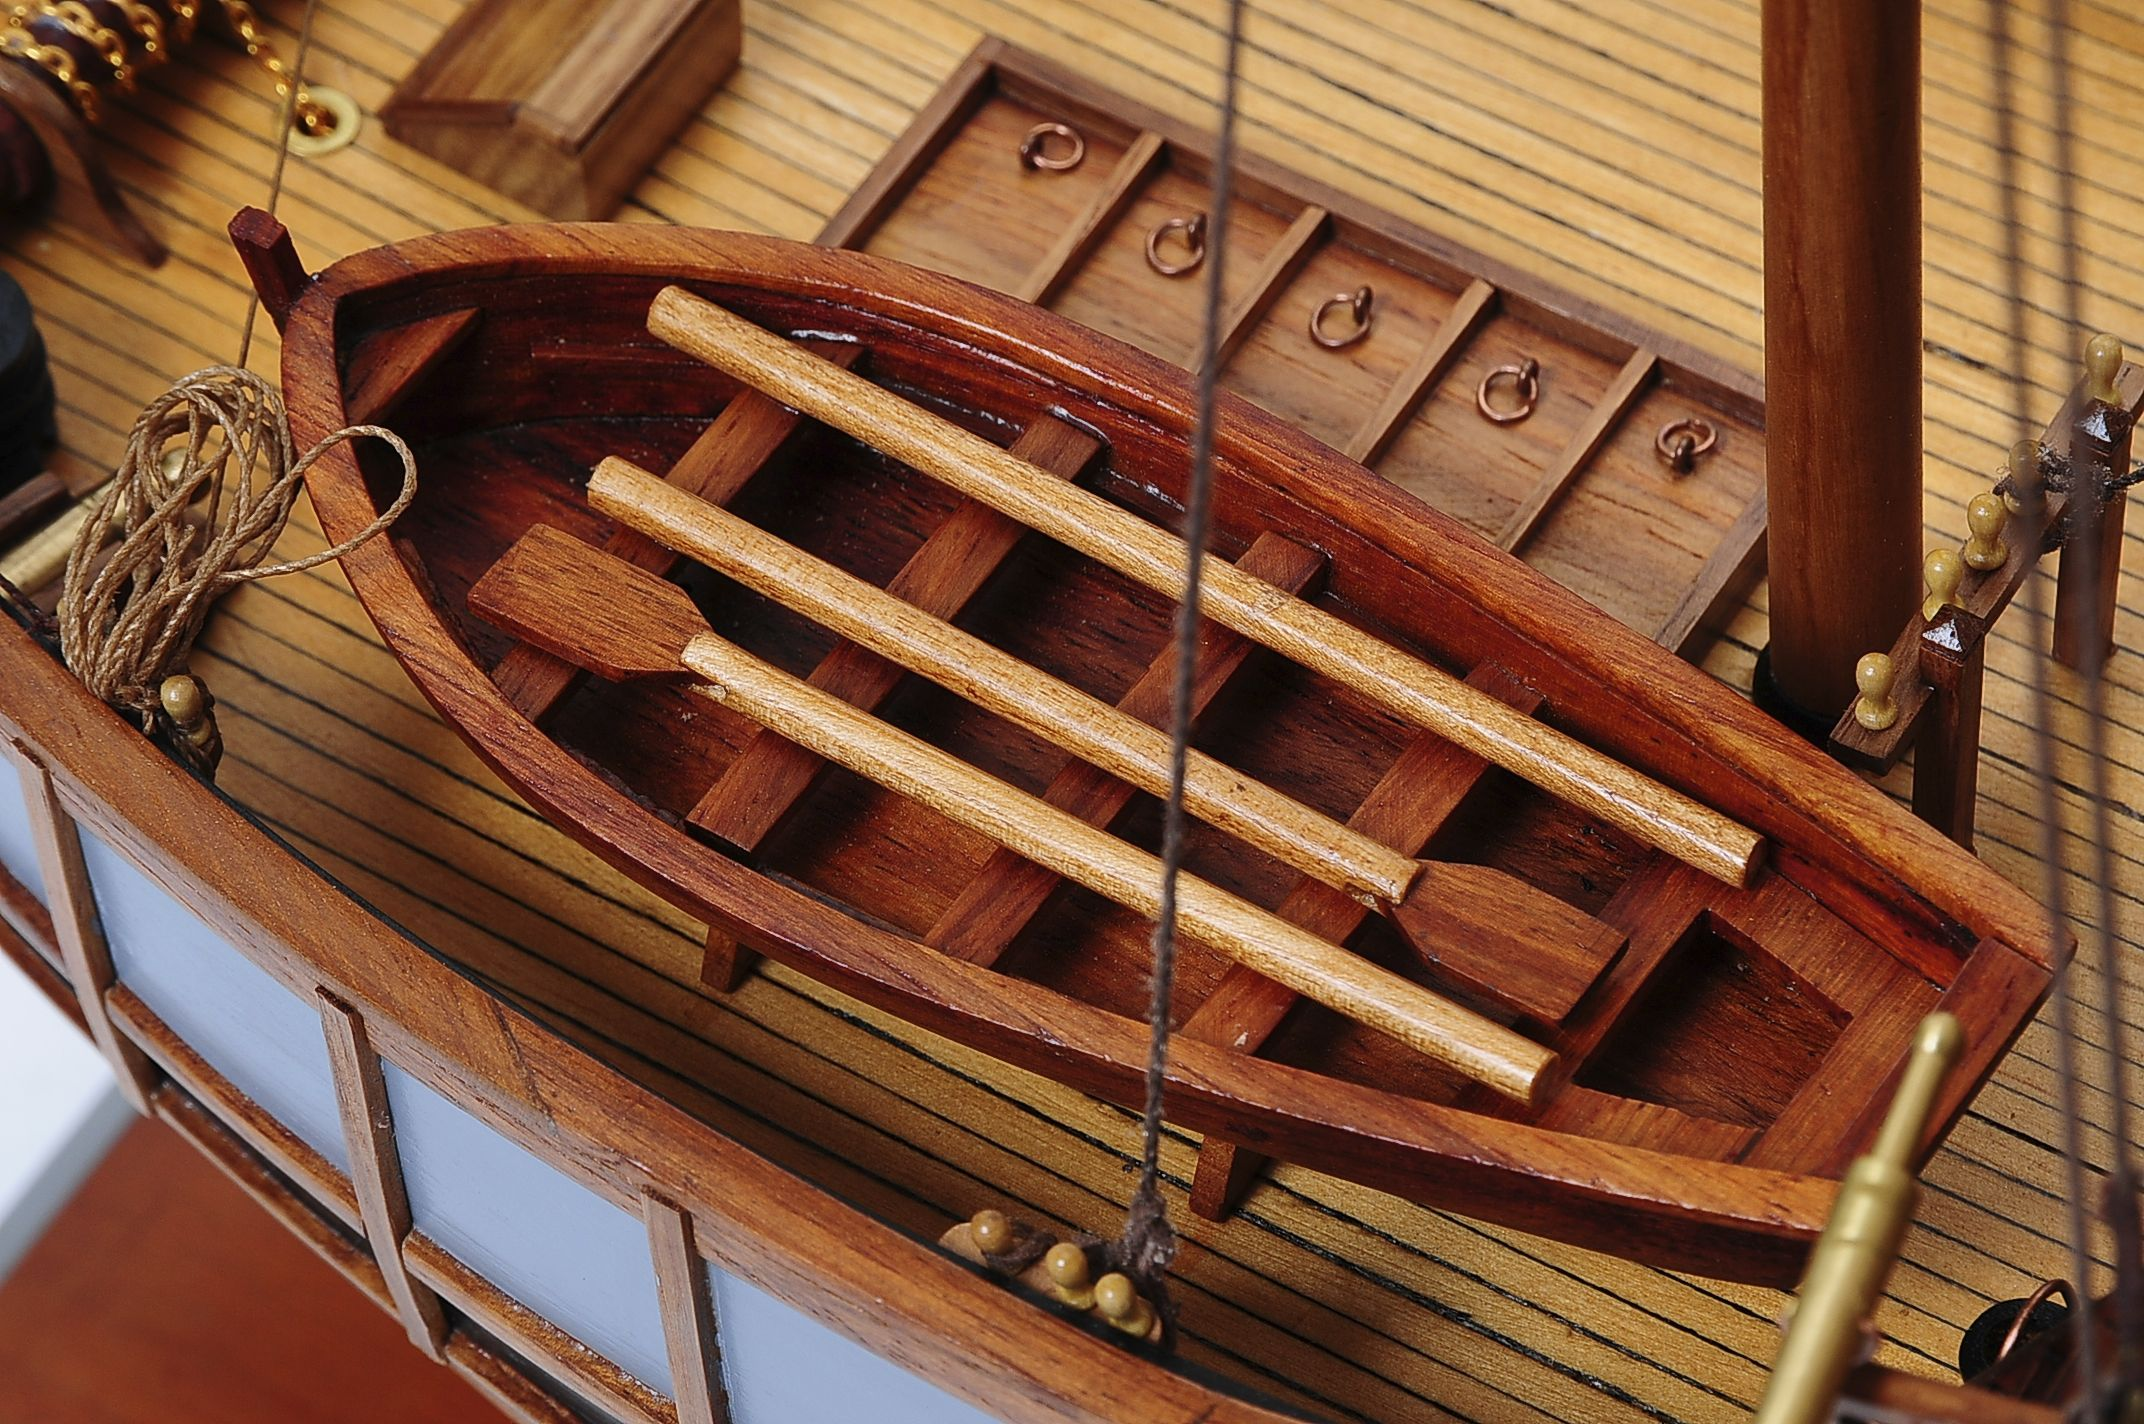 1429-6029-La-Nina-Model-Boat-Superior-Range